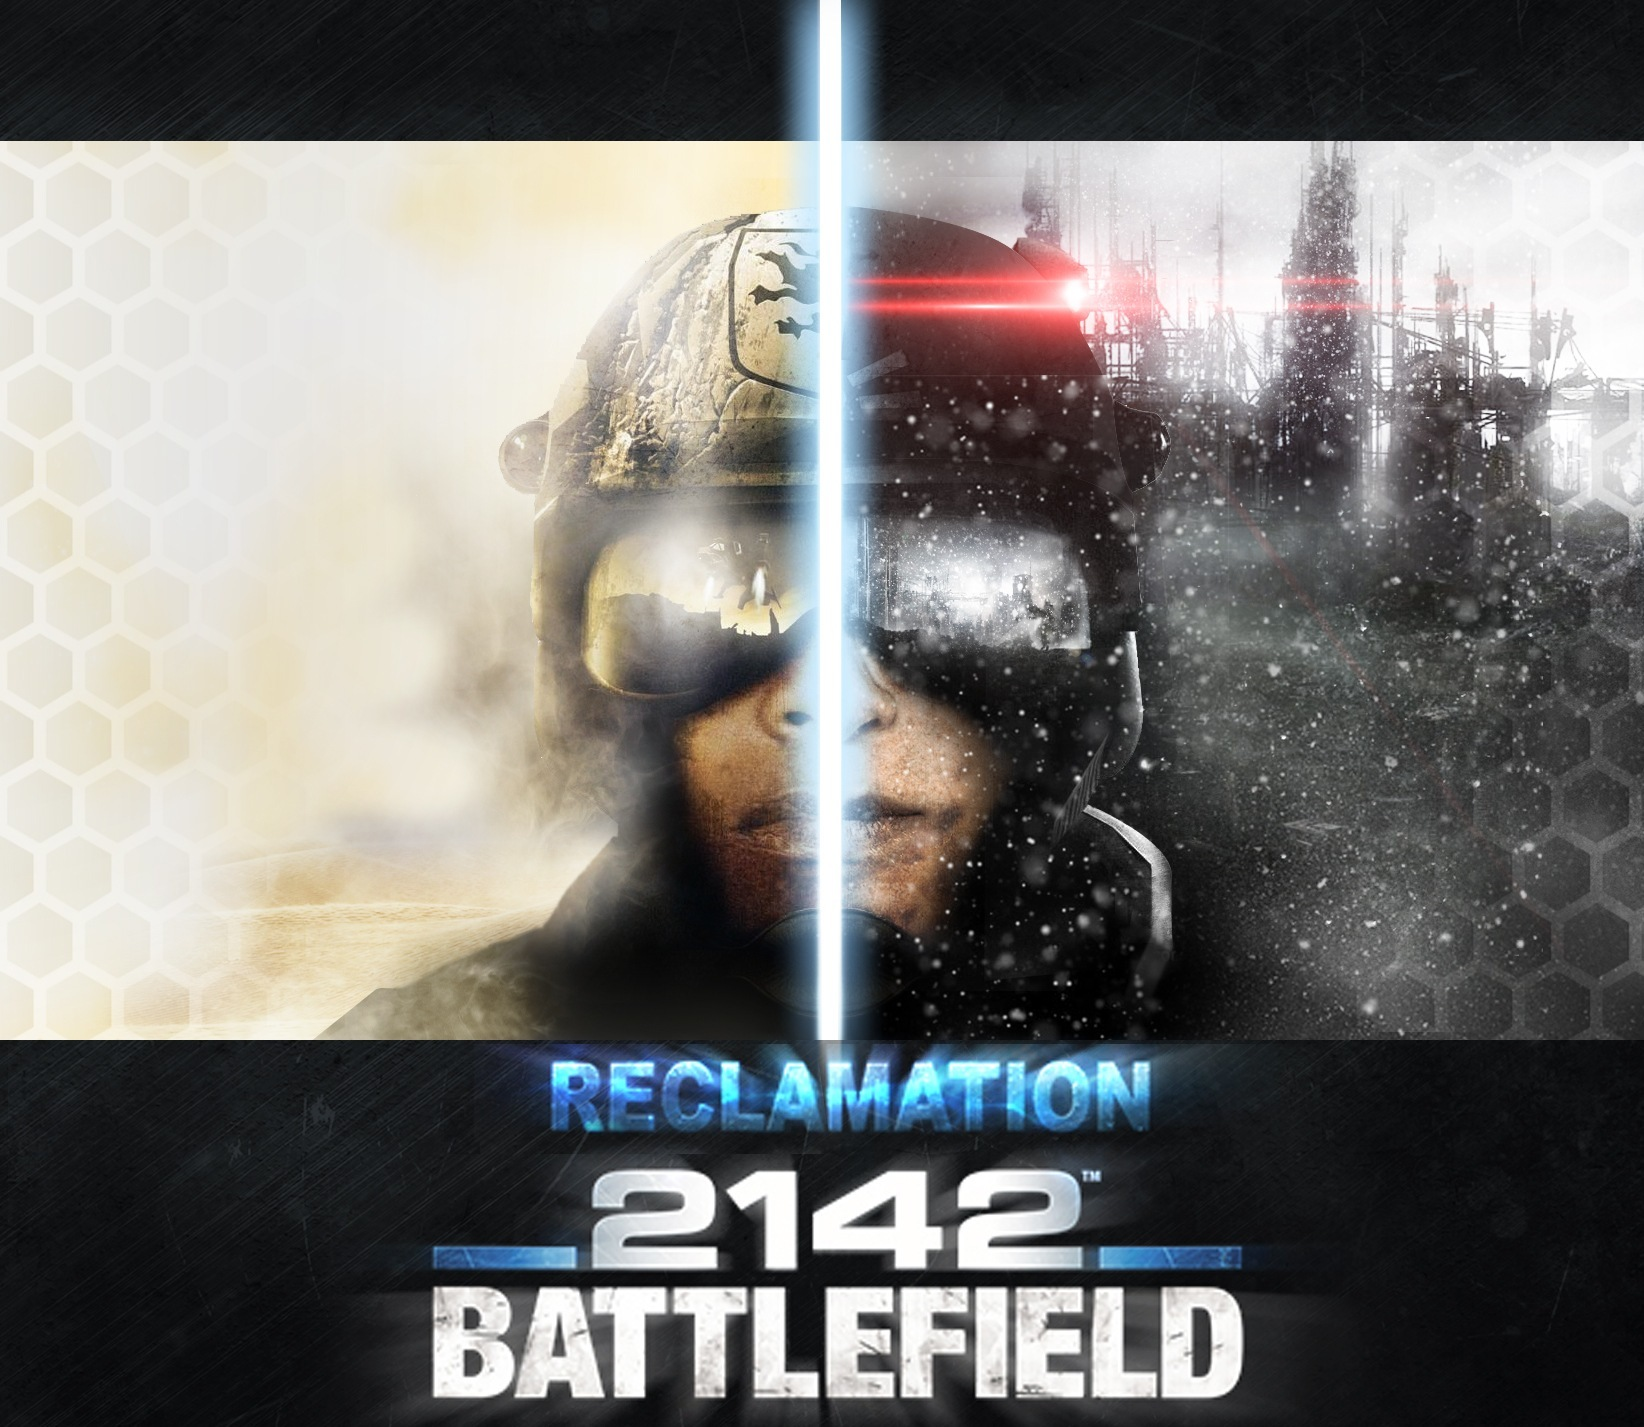 battlefield 2142 crack 1.51